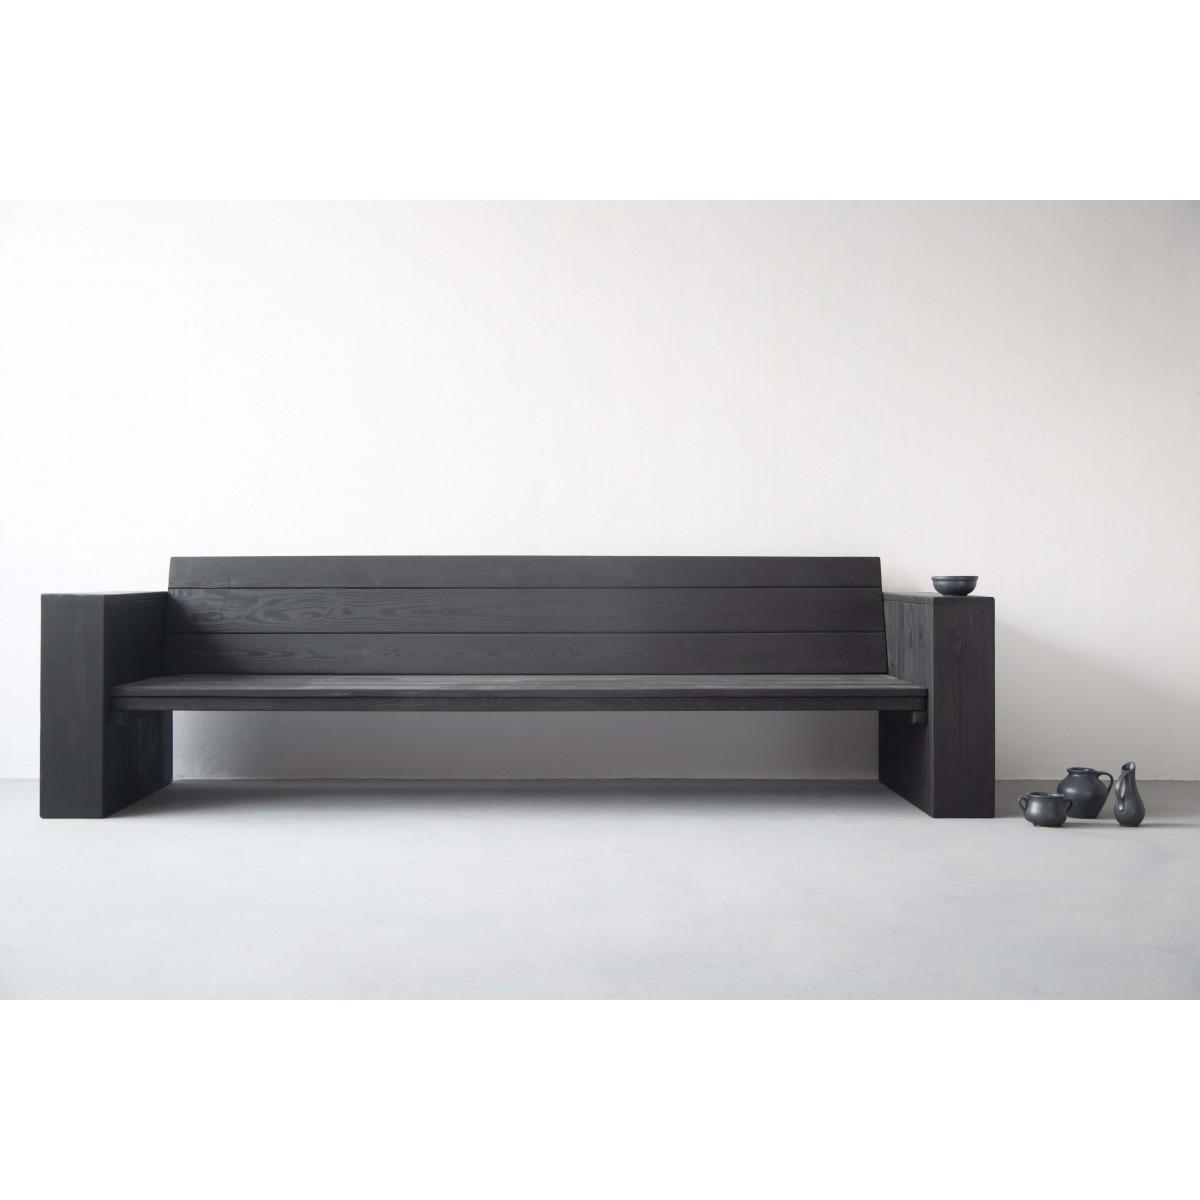 FraaiBerlin – Bank Landhaus Stil & Eisen Jonathan schwarz 250x80x80cm